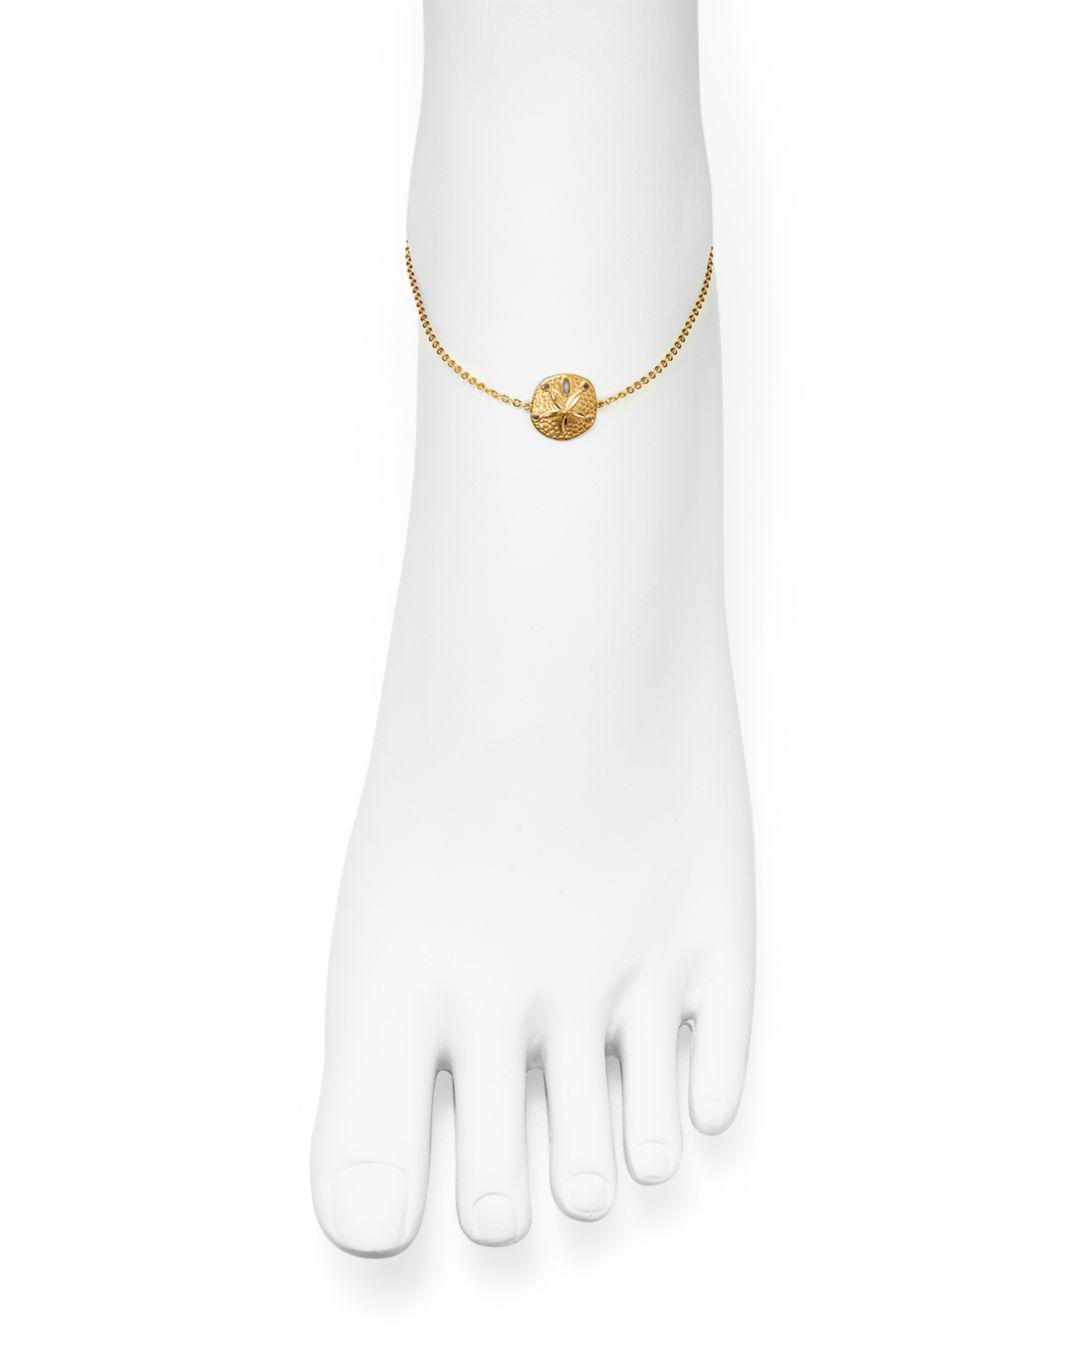 14k Yellow Gold Sand Dollar Ankle Bracelet